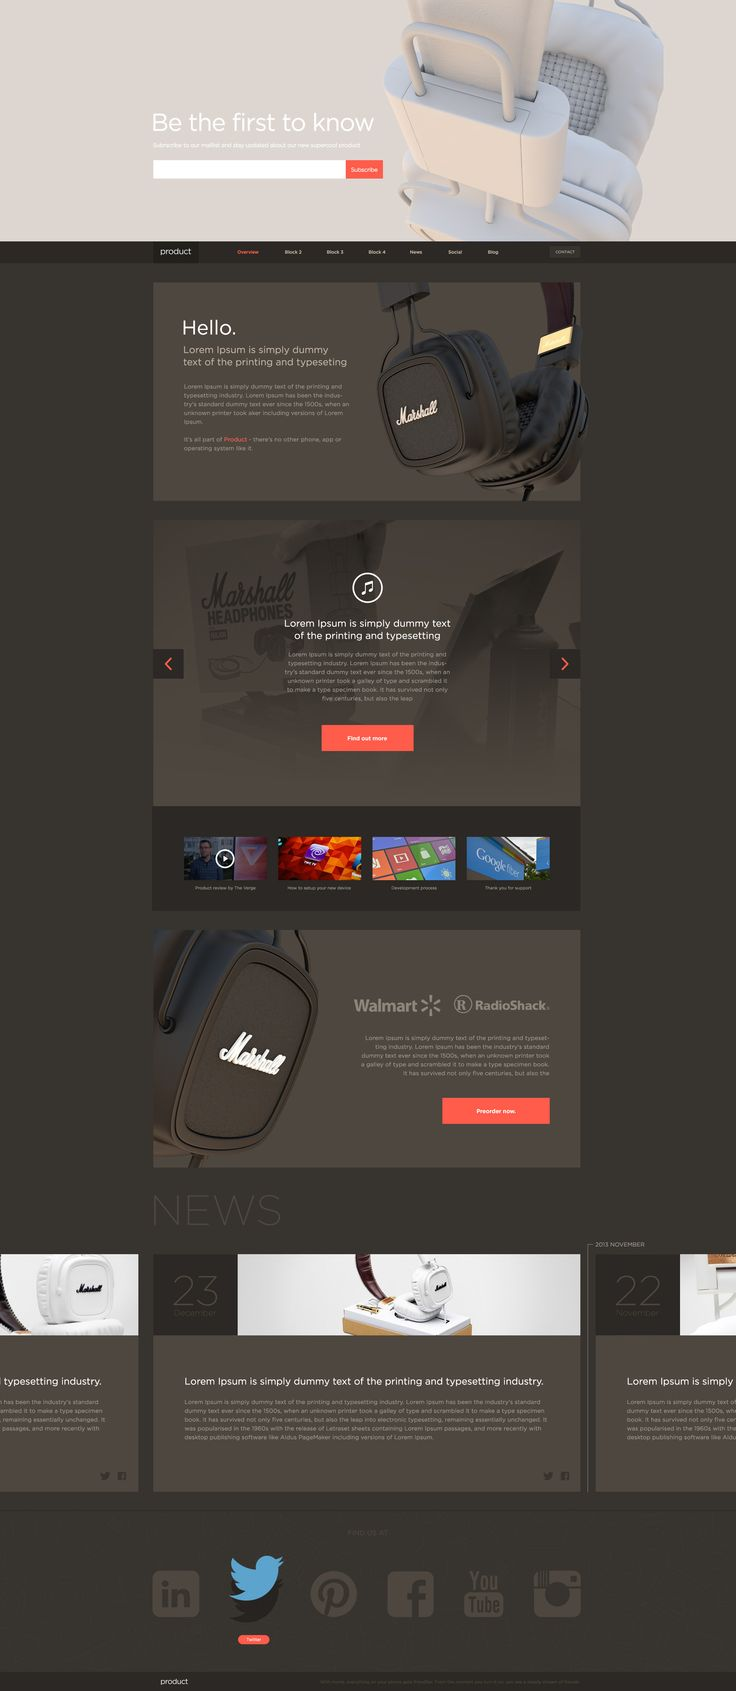 #web design, dark, clean and minimal